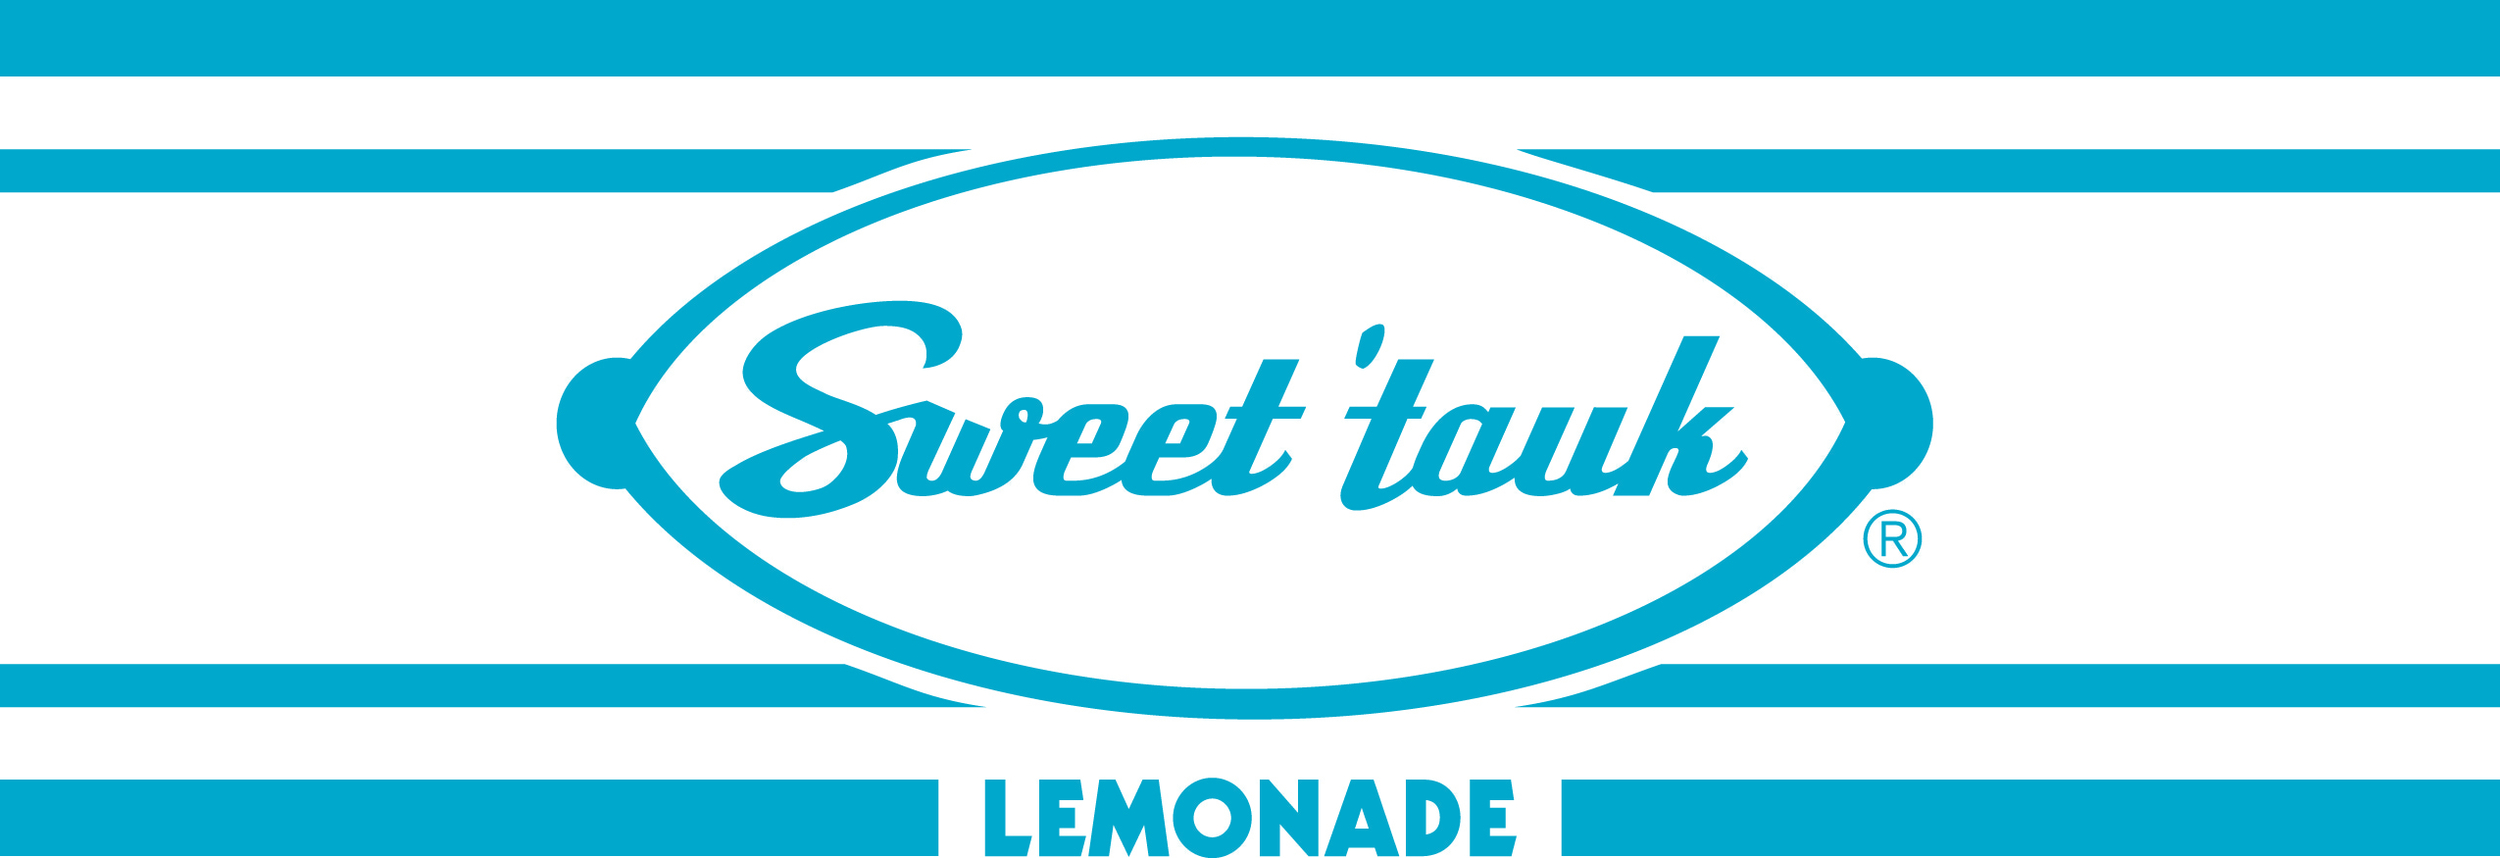 Sweettauk-logo.jpg